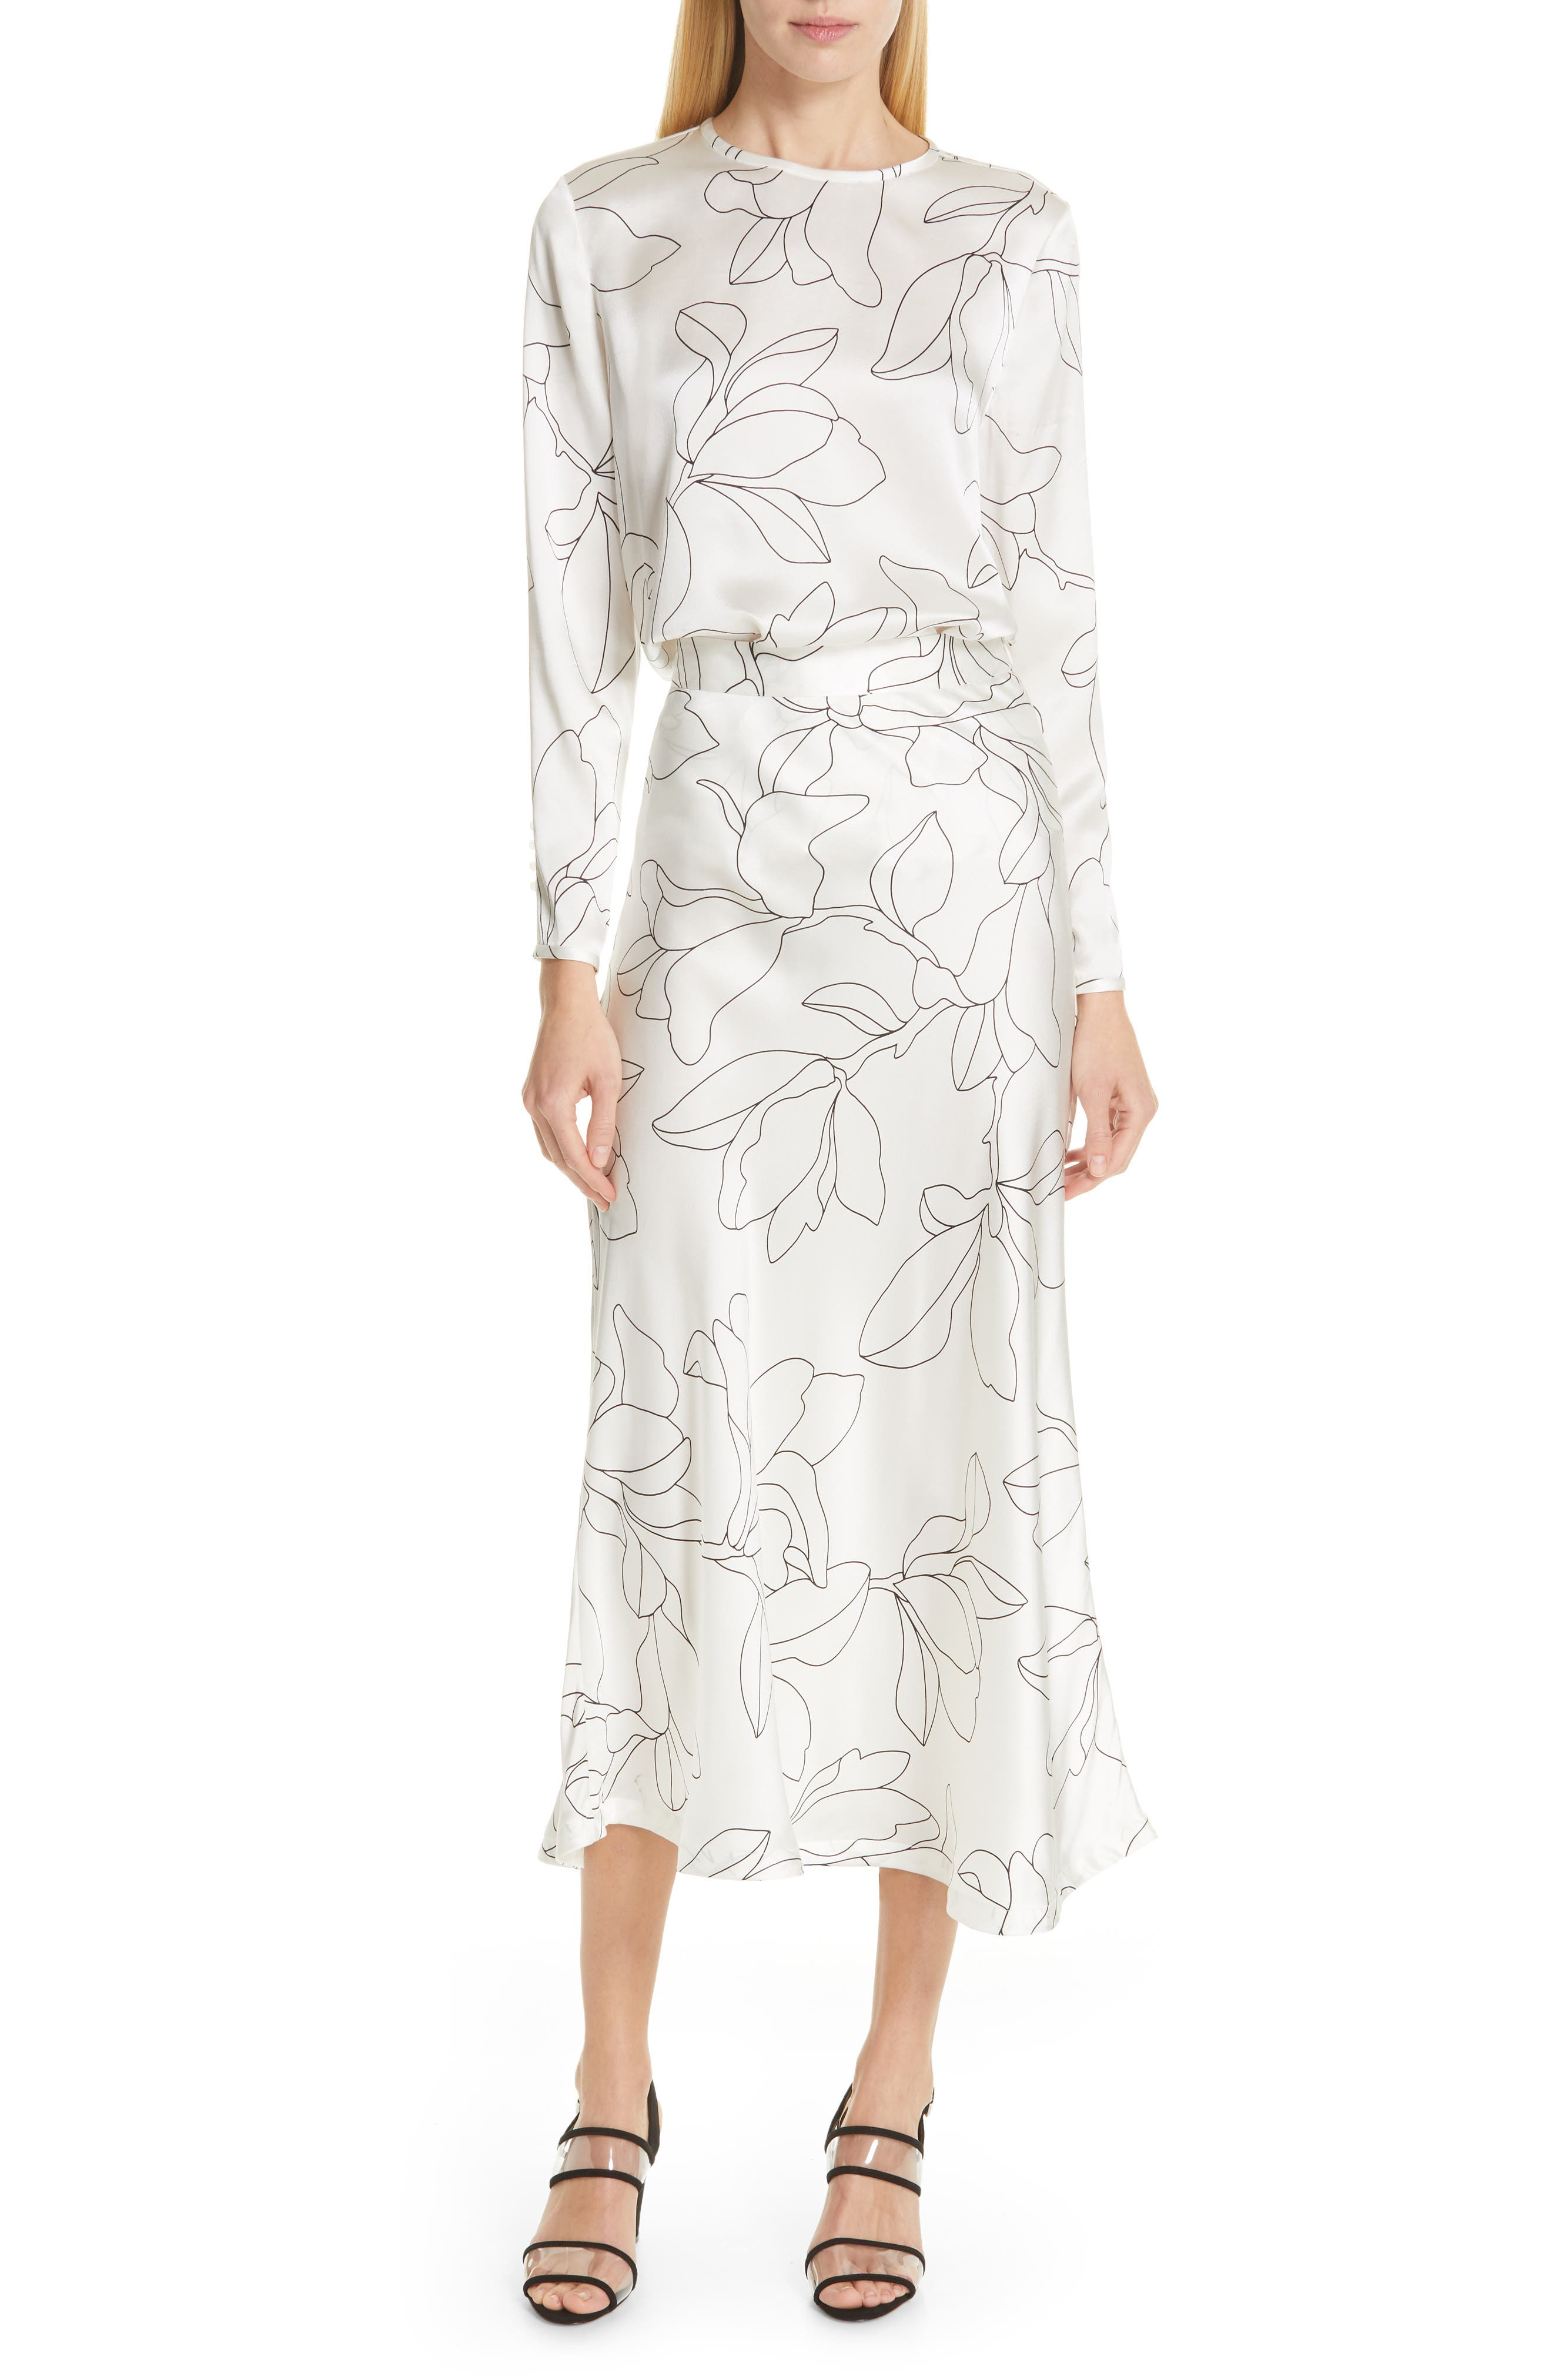 Iva Floral Silk Midi Skirt,                             Alternate thumbnail 7, color,                             NATURAL WHITE TRUE BLACK